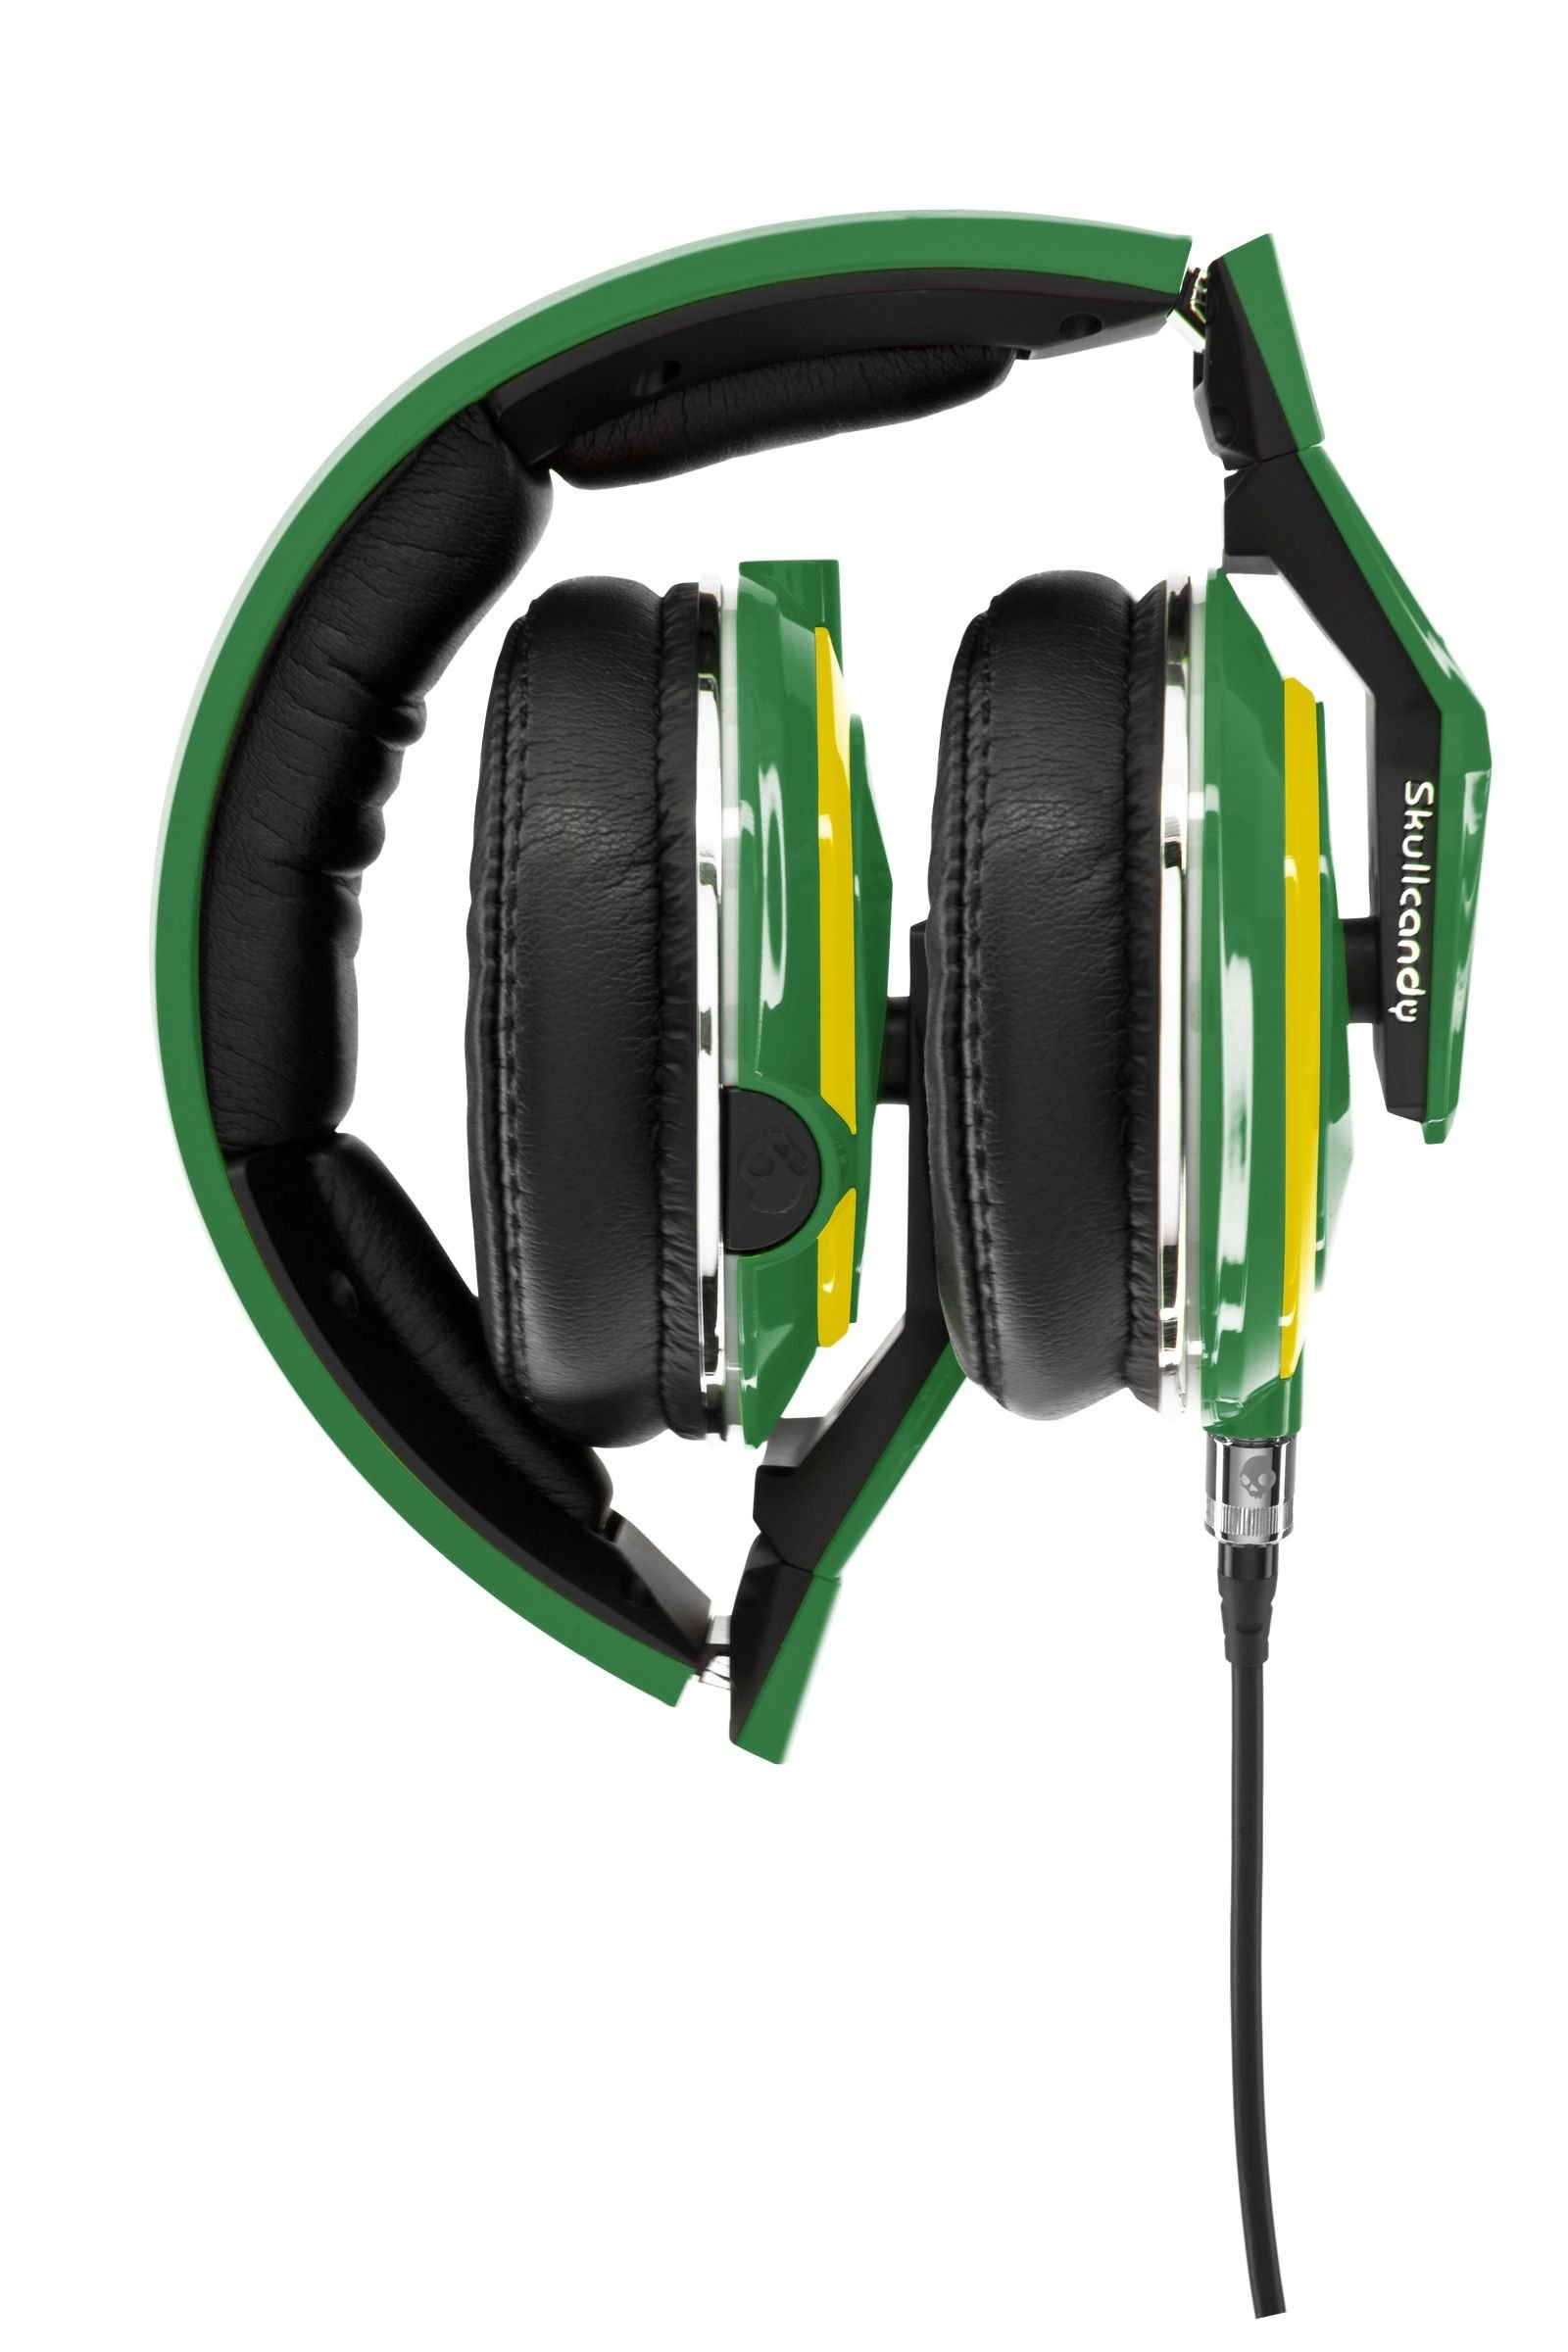 Skullcandy Mix Master Headphones with DJ Capabilities and 3 Button Mic, NBA Boston Celtics by Skullcandy (Image #5)